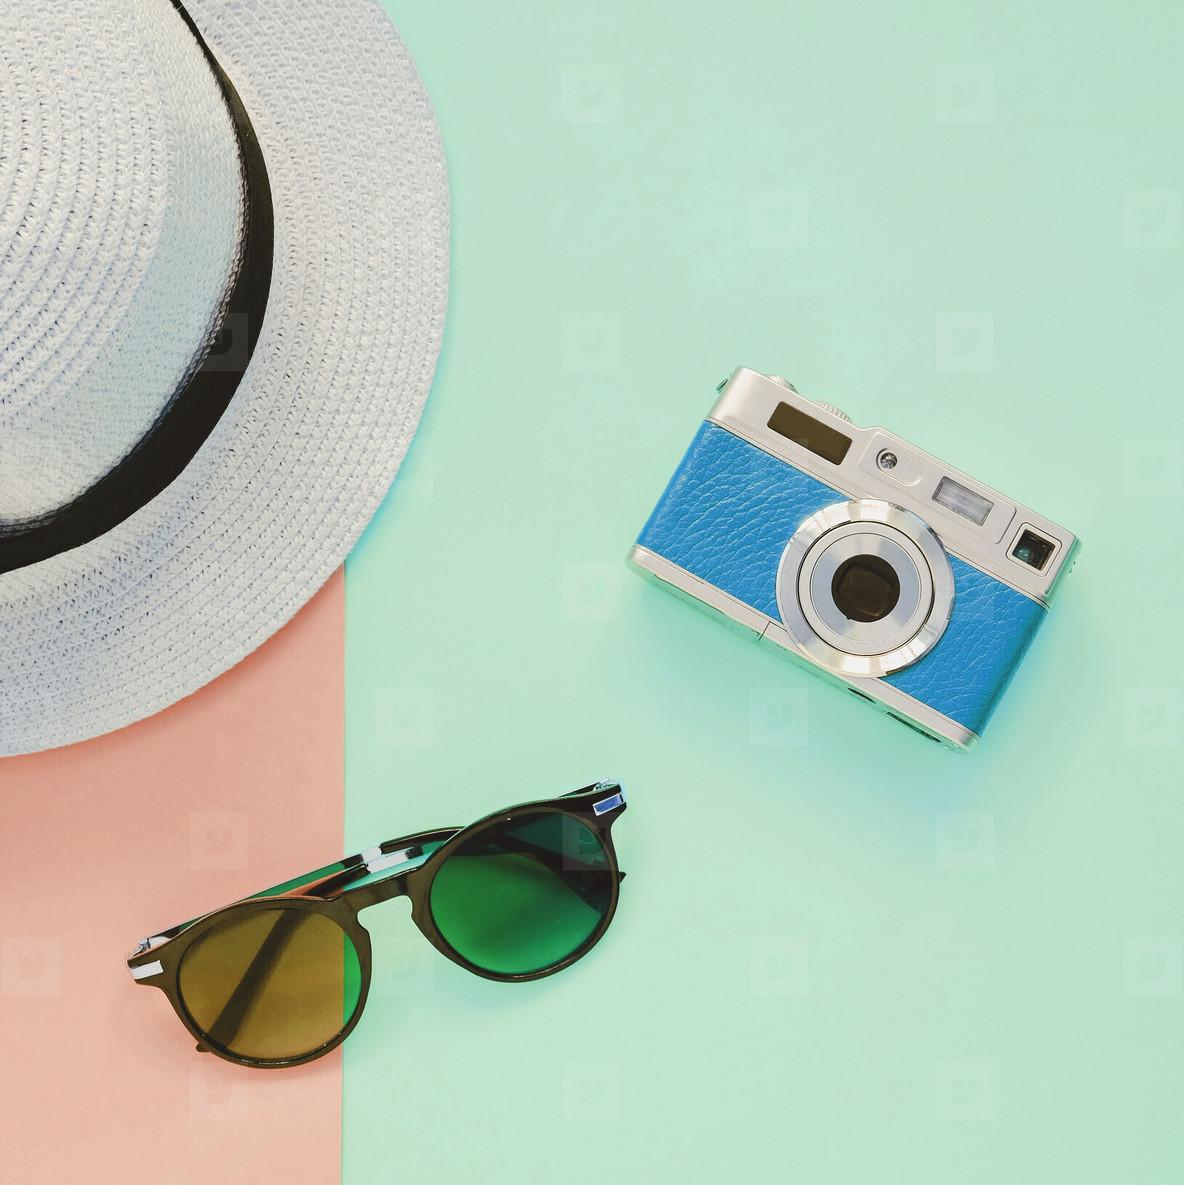 Creative Flat lay fashion style with camera  sunglasses